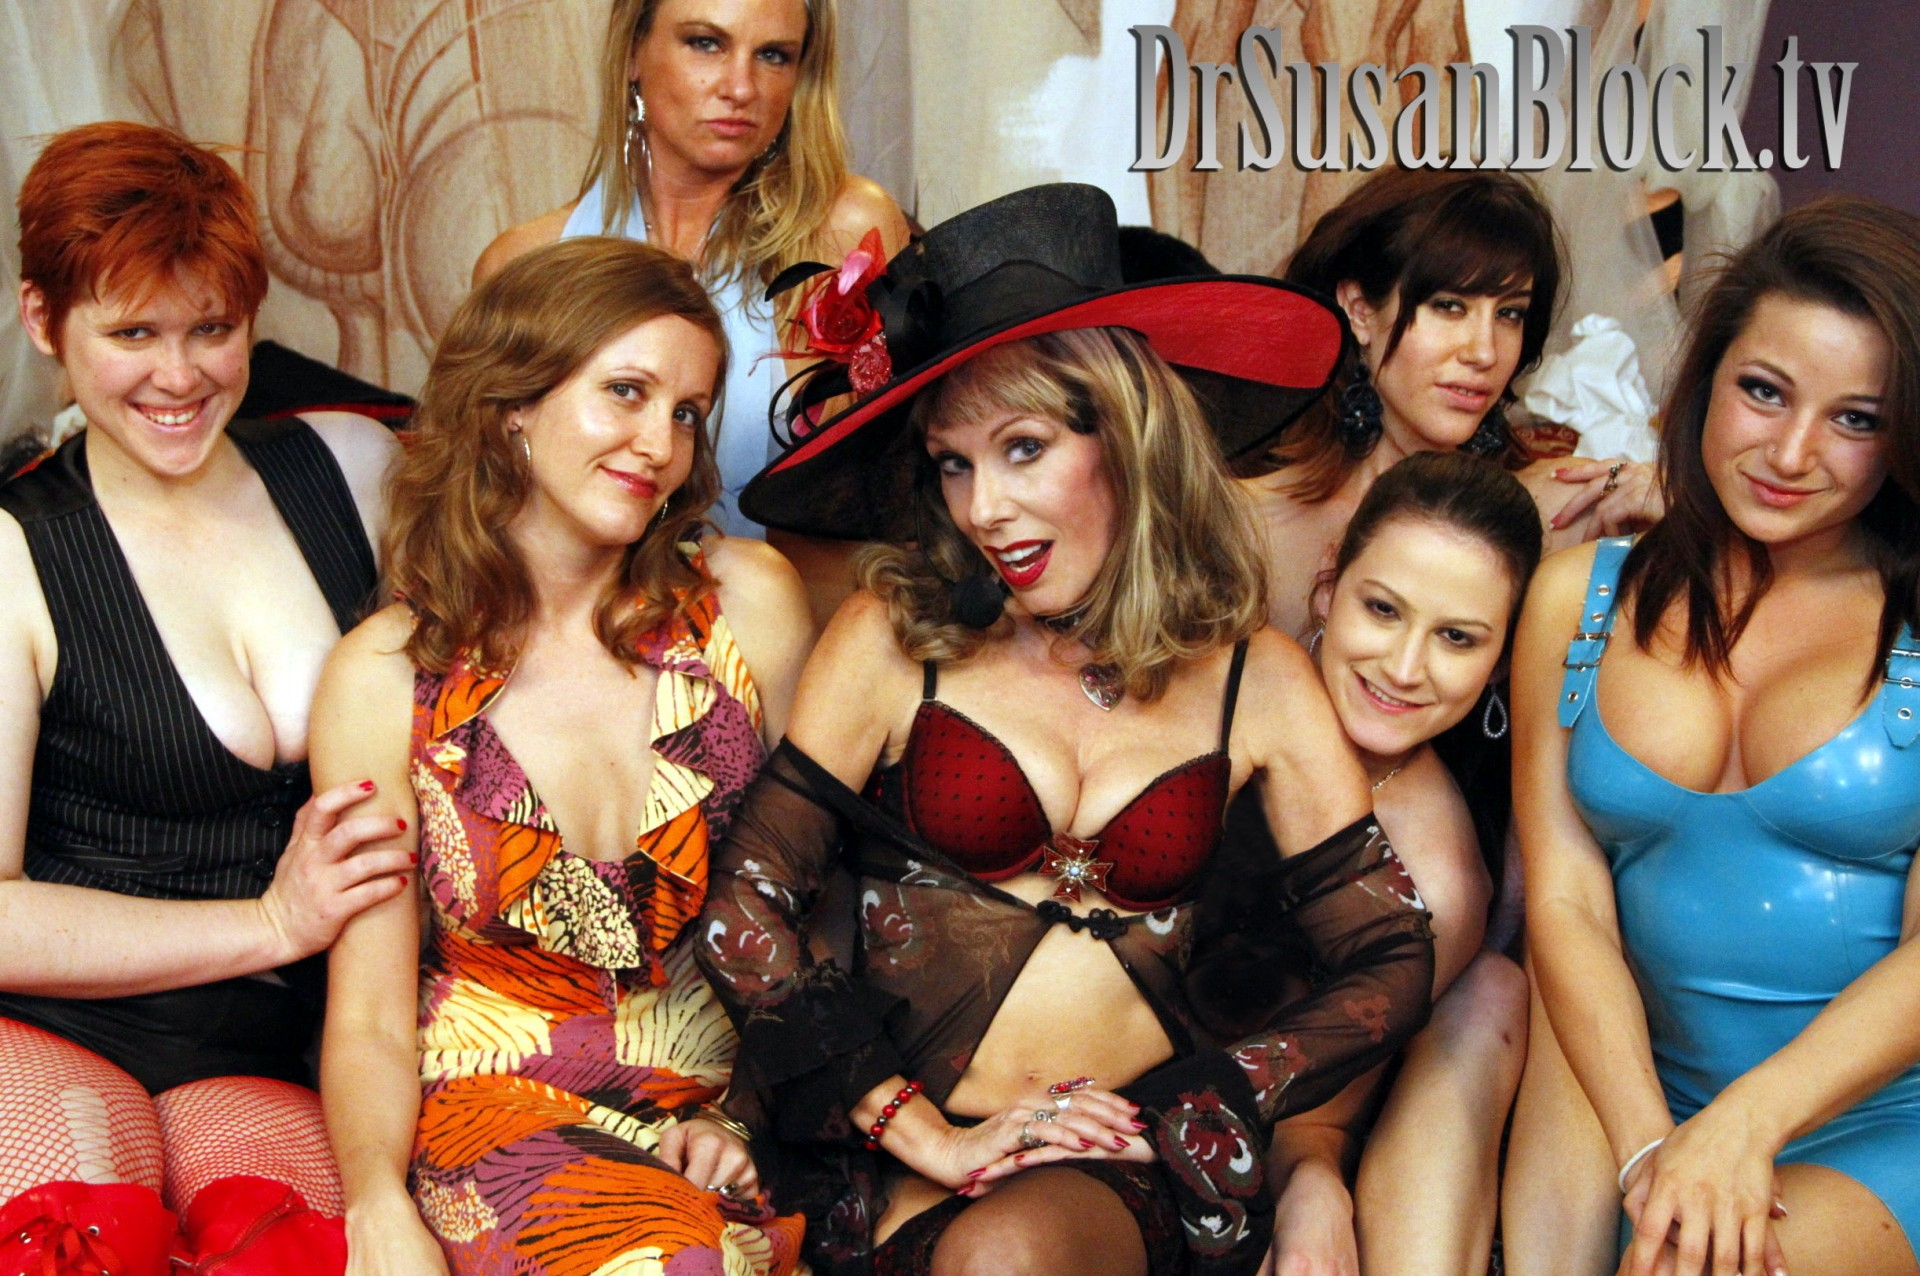 "Lily Cade, Dr. Chauntelle, Amanda Blow, Dr. Susan Block, Addie Juniper, Sasha Sweet, Charity Bangs in ""Masturbation Education"" on DrSuzy.Tv"